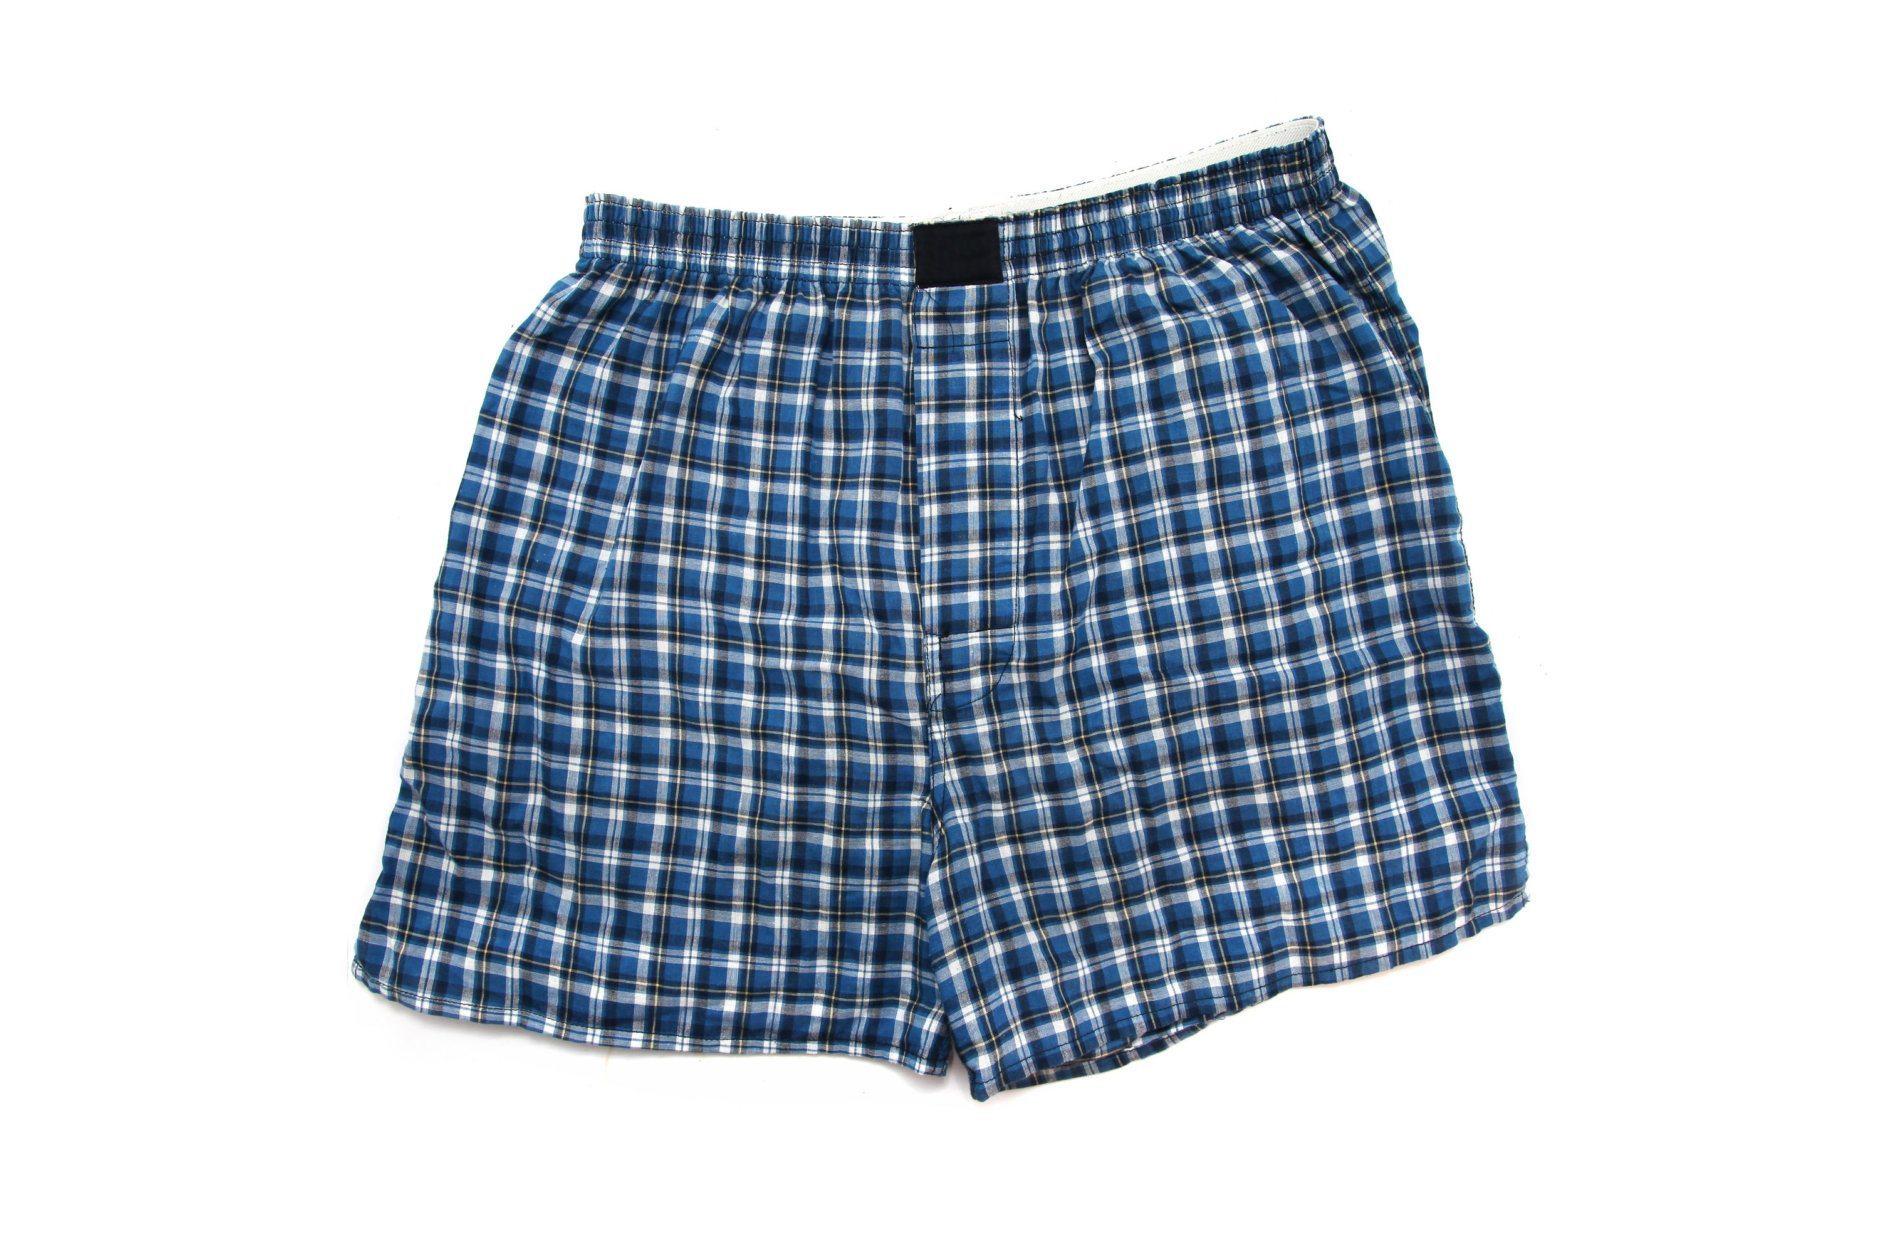 Blue Boxer underwear isolated white background